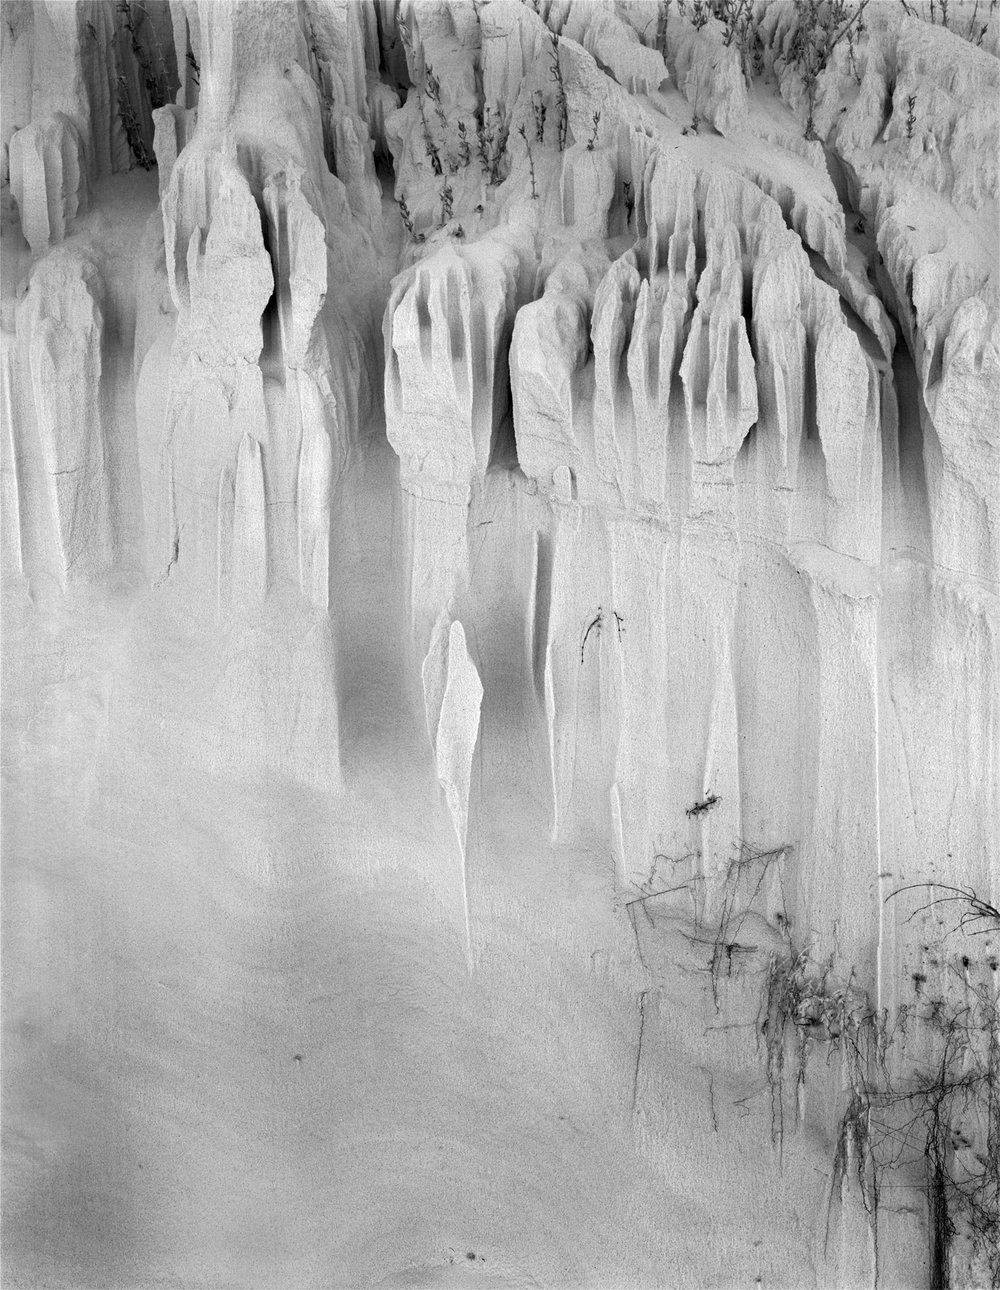 sand-crevasses--16-by-20.jpg